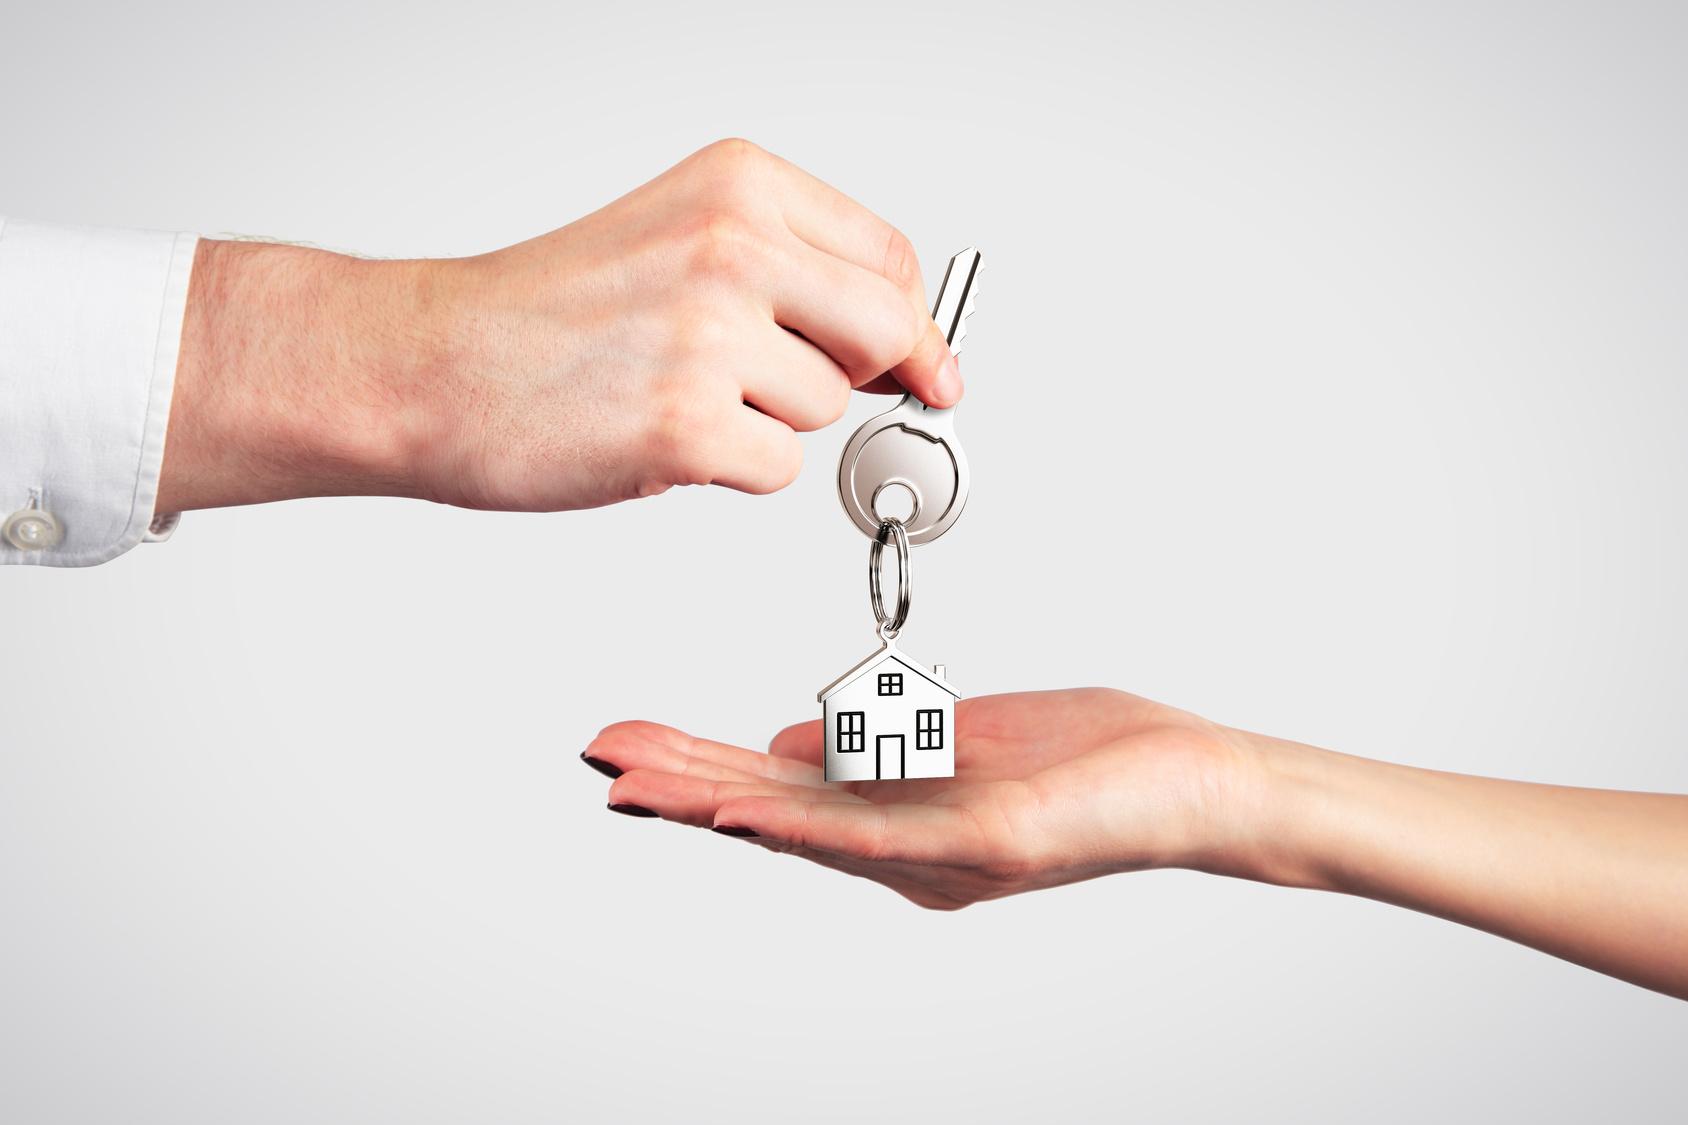 Споры по субаренде без согласия арендодателя